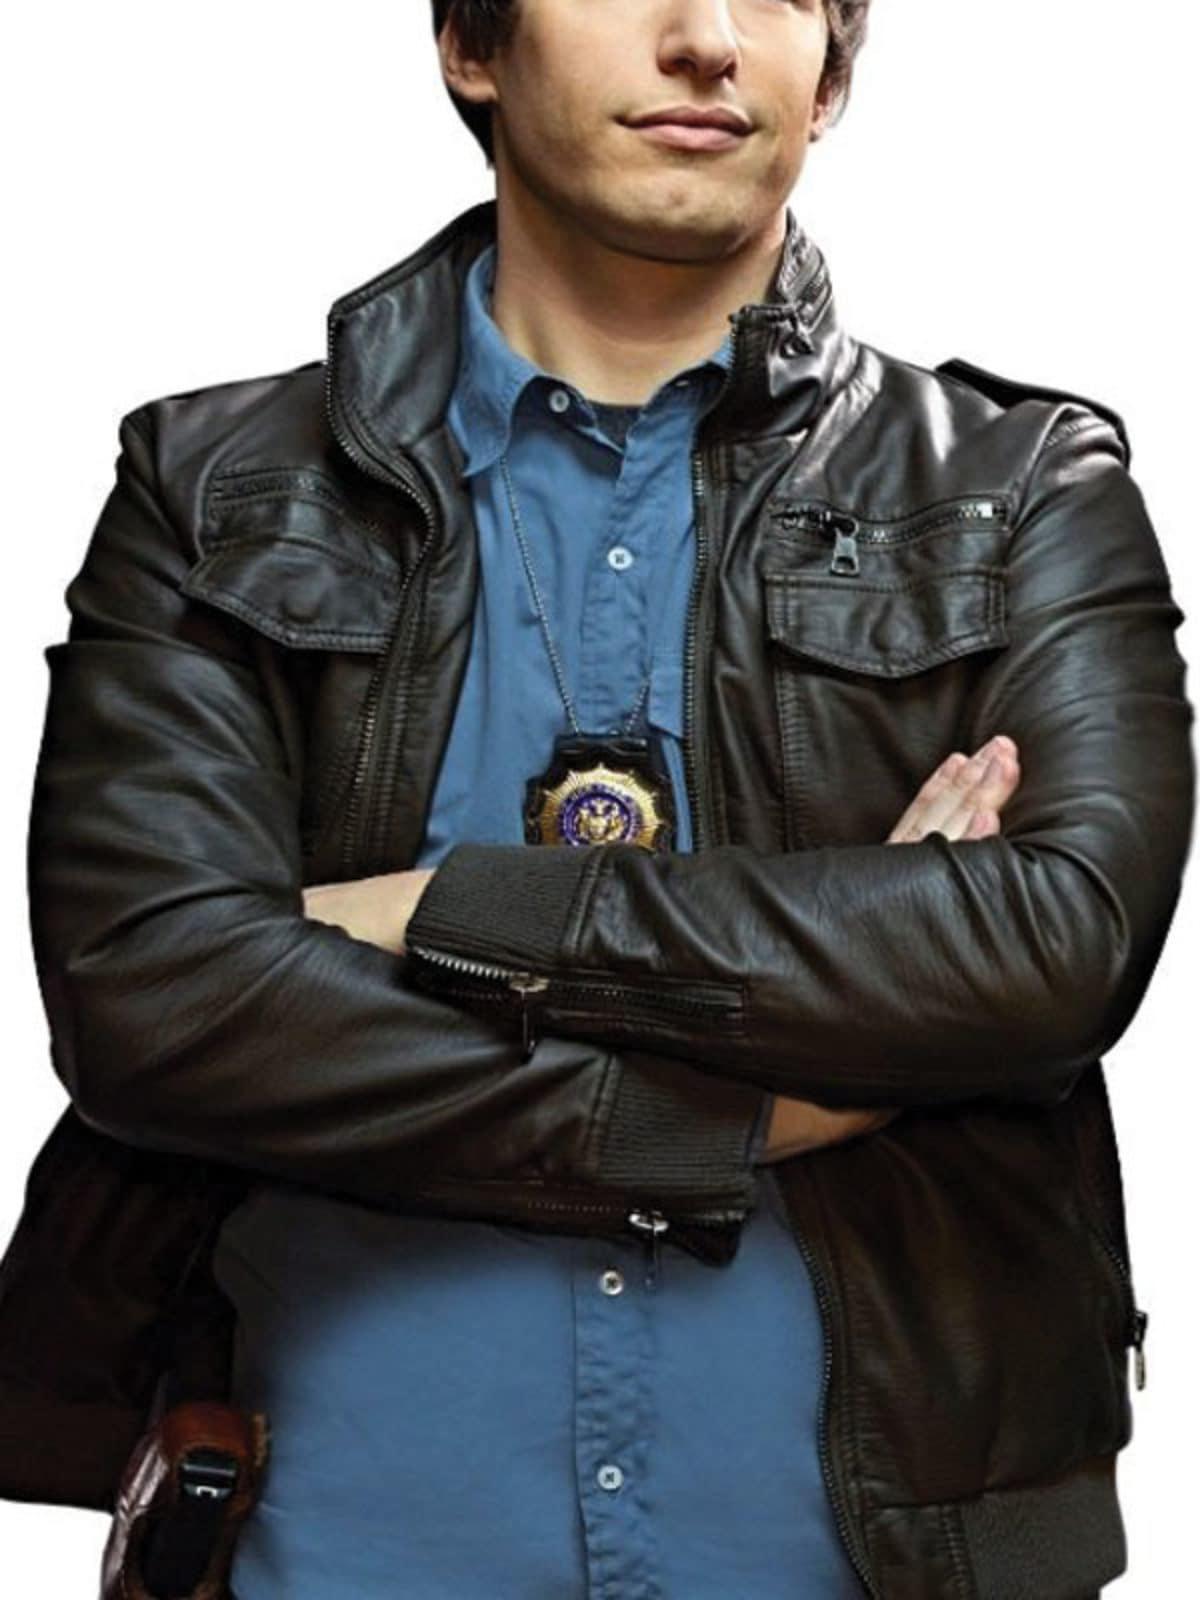 Andy Samberg Jacket